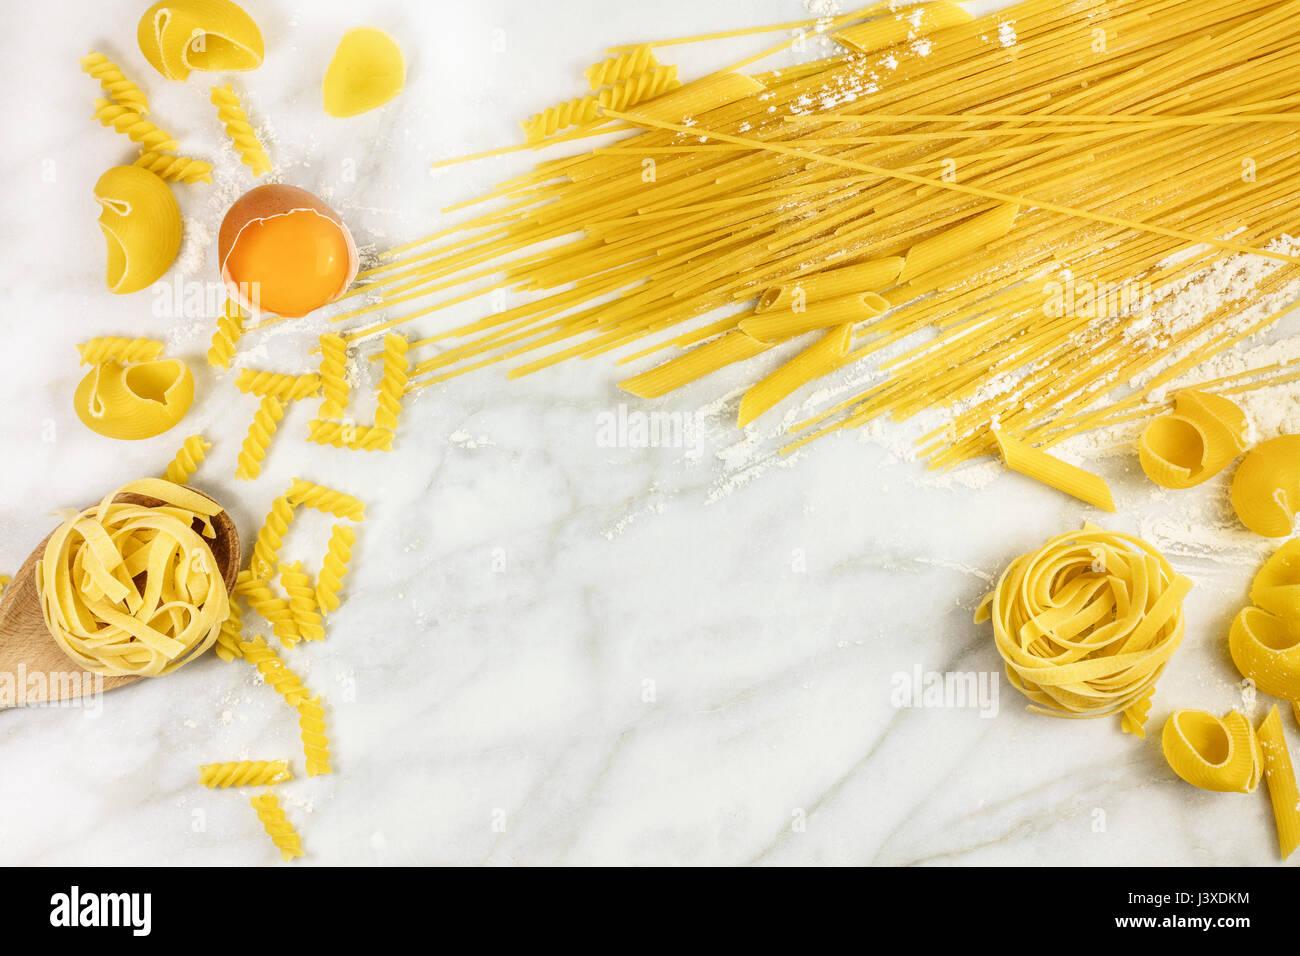 Riccioli Stockfotos & Riccioli Bilder - Alamy